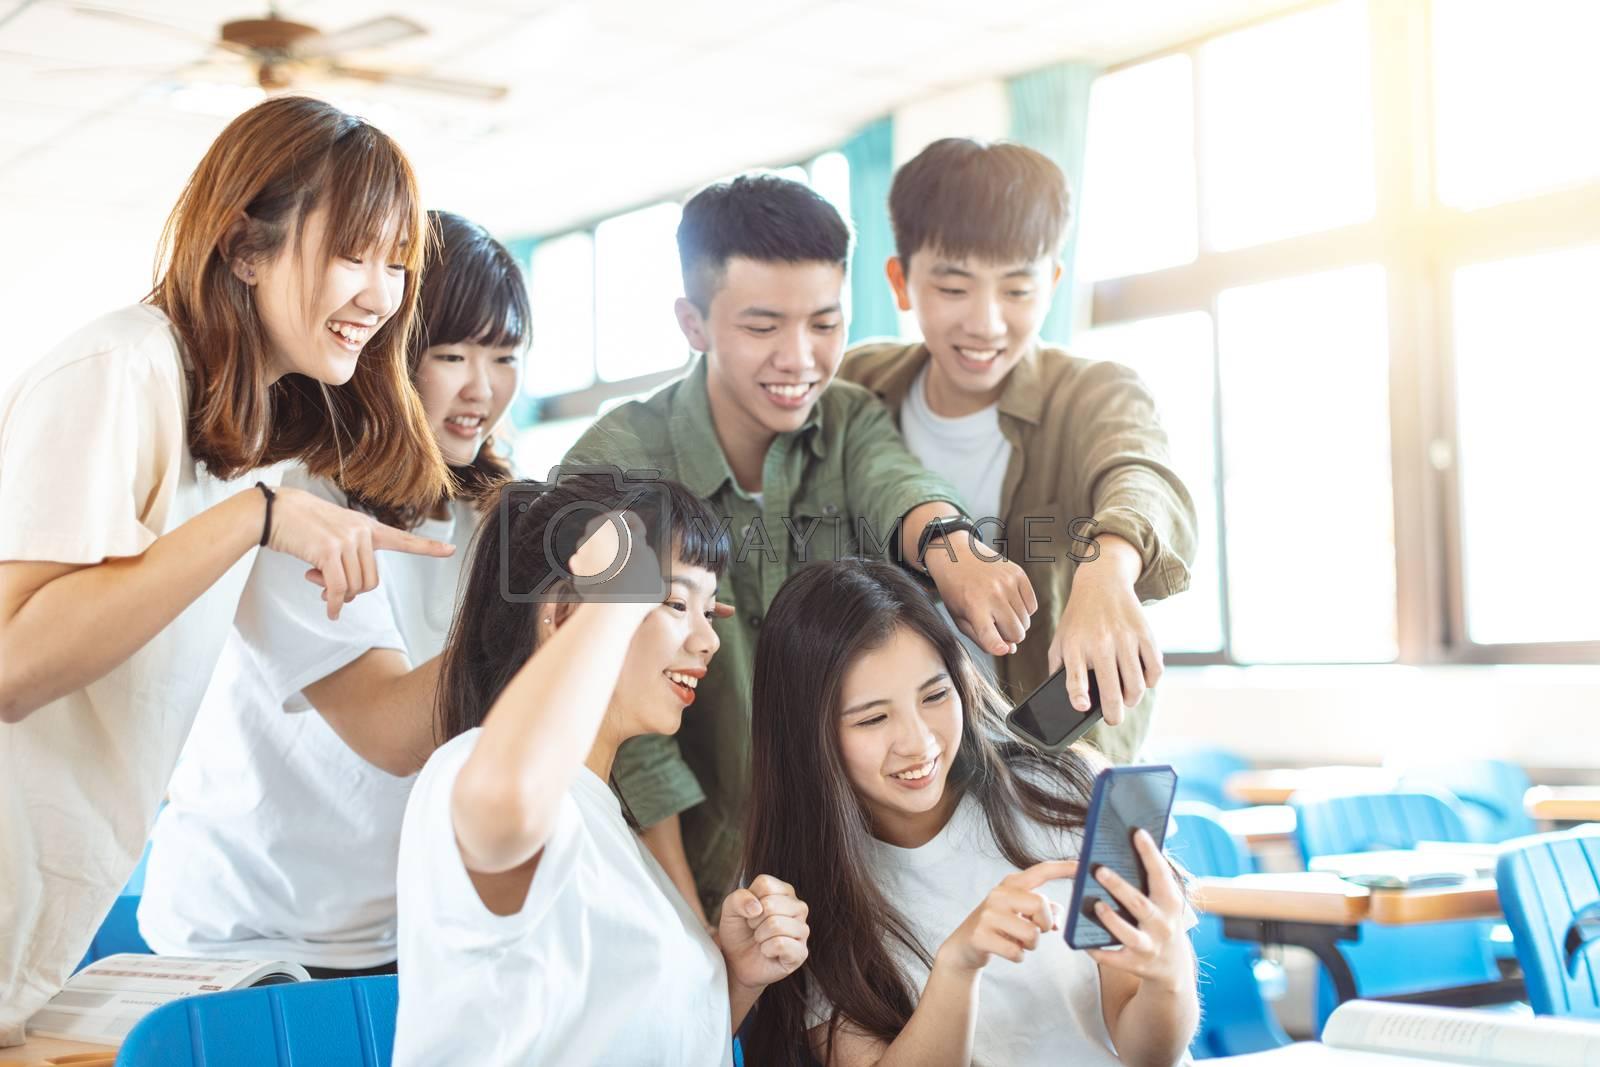 happy students looking at smartphones  in classroom